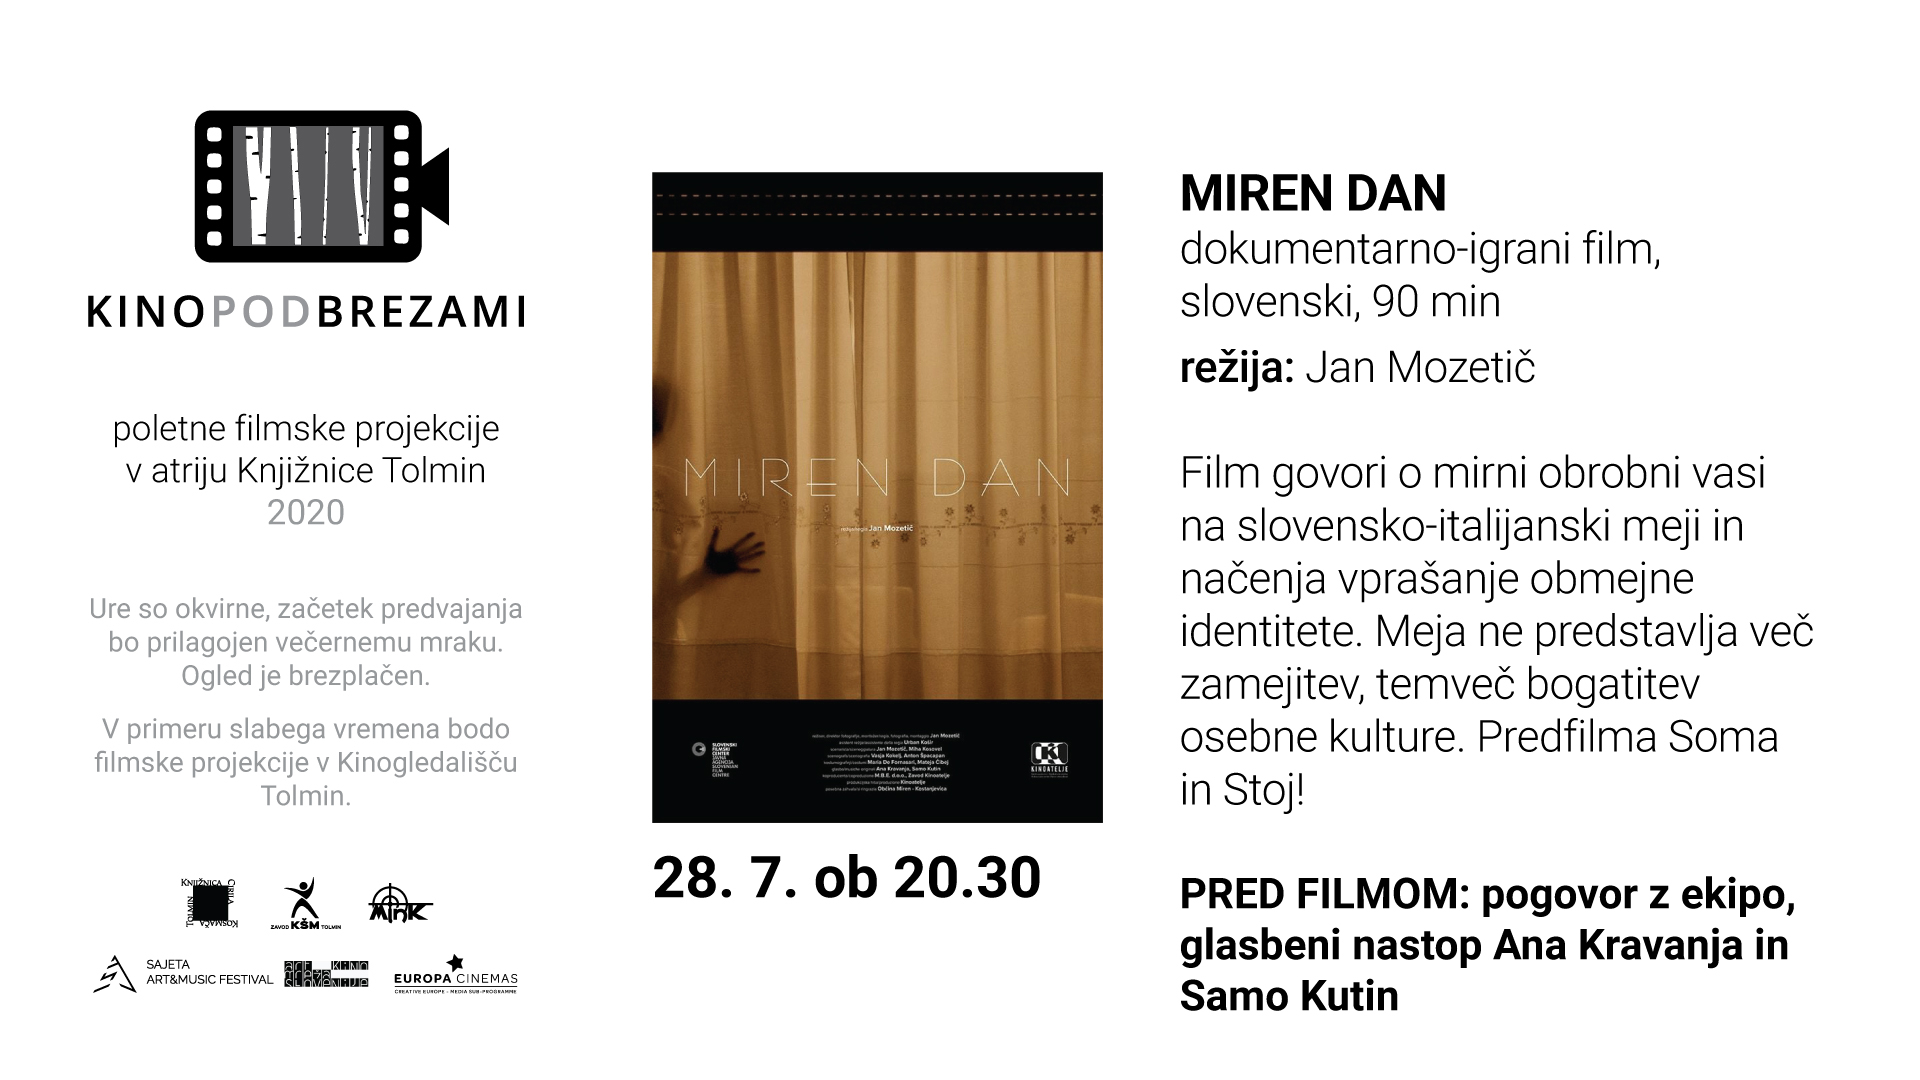 Kino pod brezami: MIREN DAN (dokumentarec)